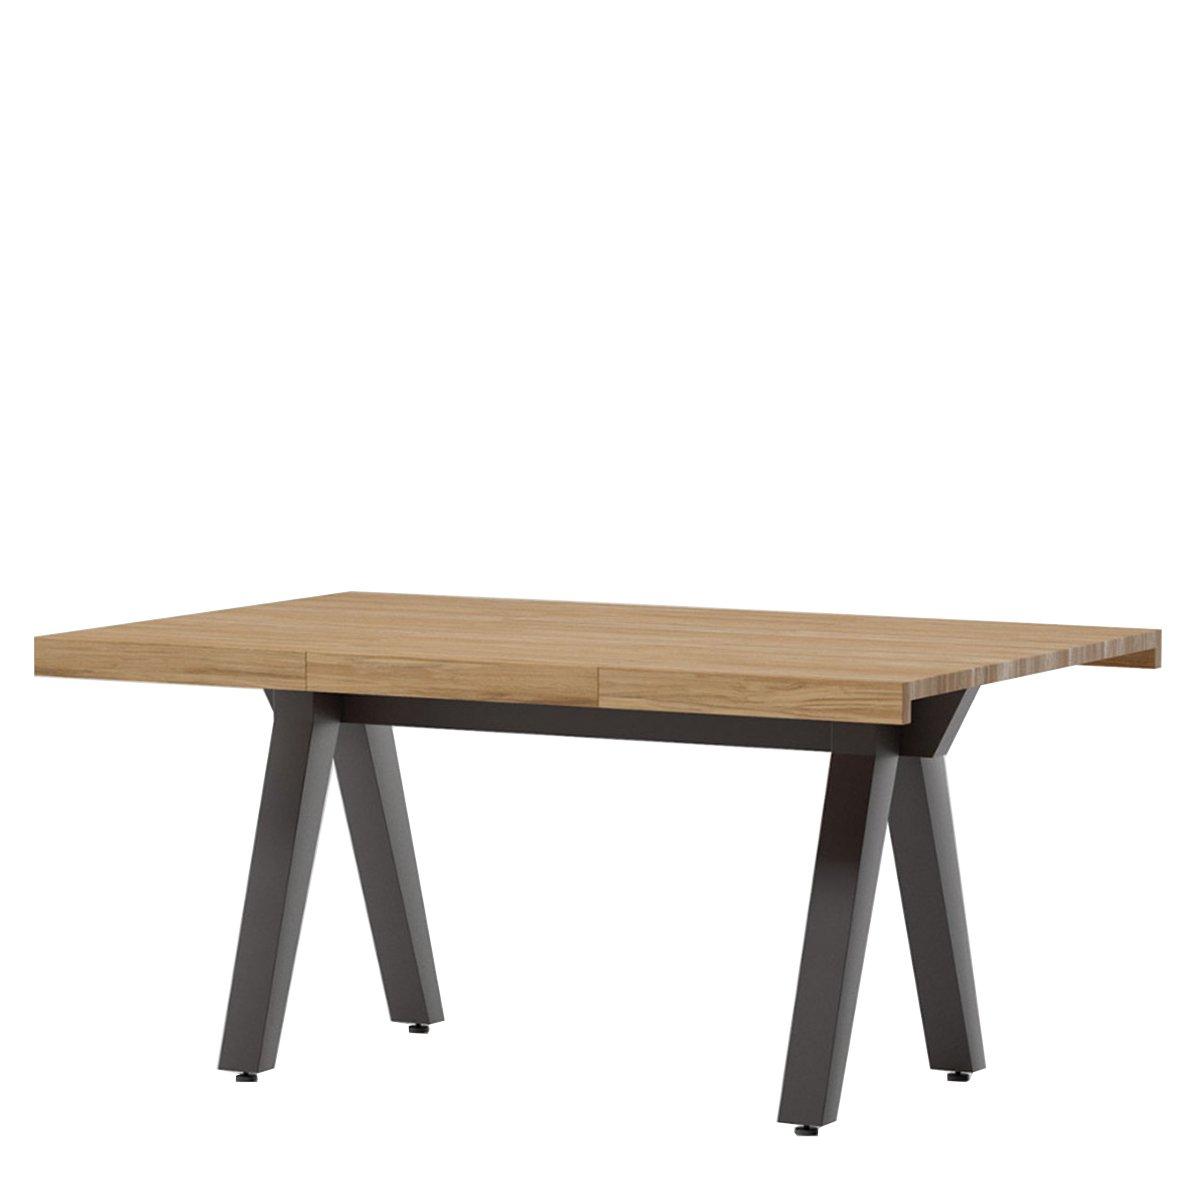 Kettal Vieques Eettafel 160 x 100 cm. - Teak - Manganese